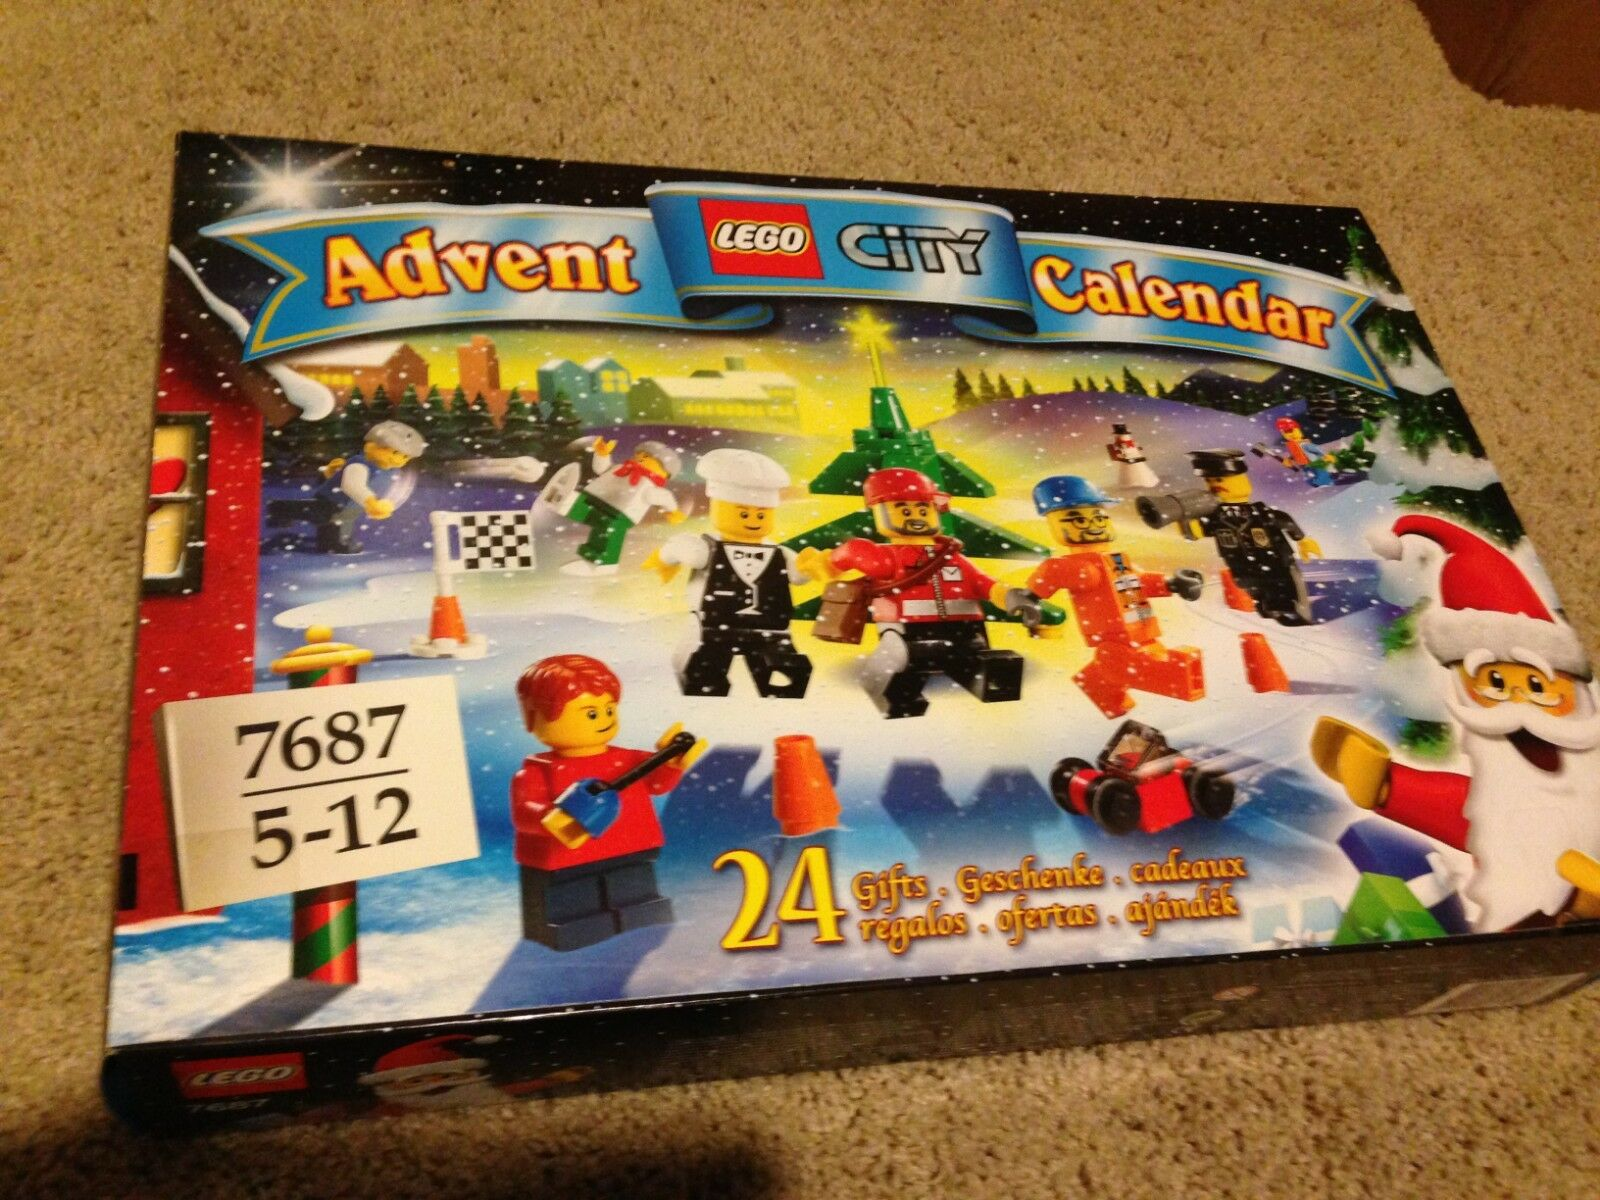 LEGO City Advent Calendar 2009 (7687) (7687) (7687) 35a0b6